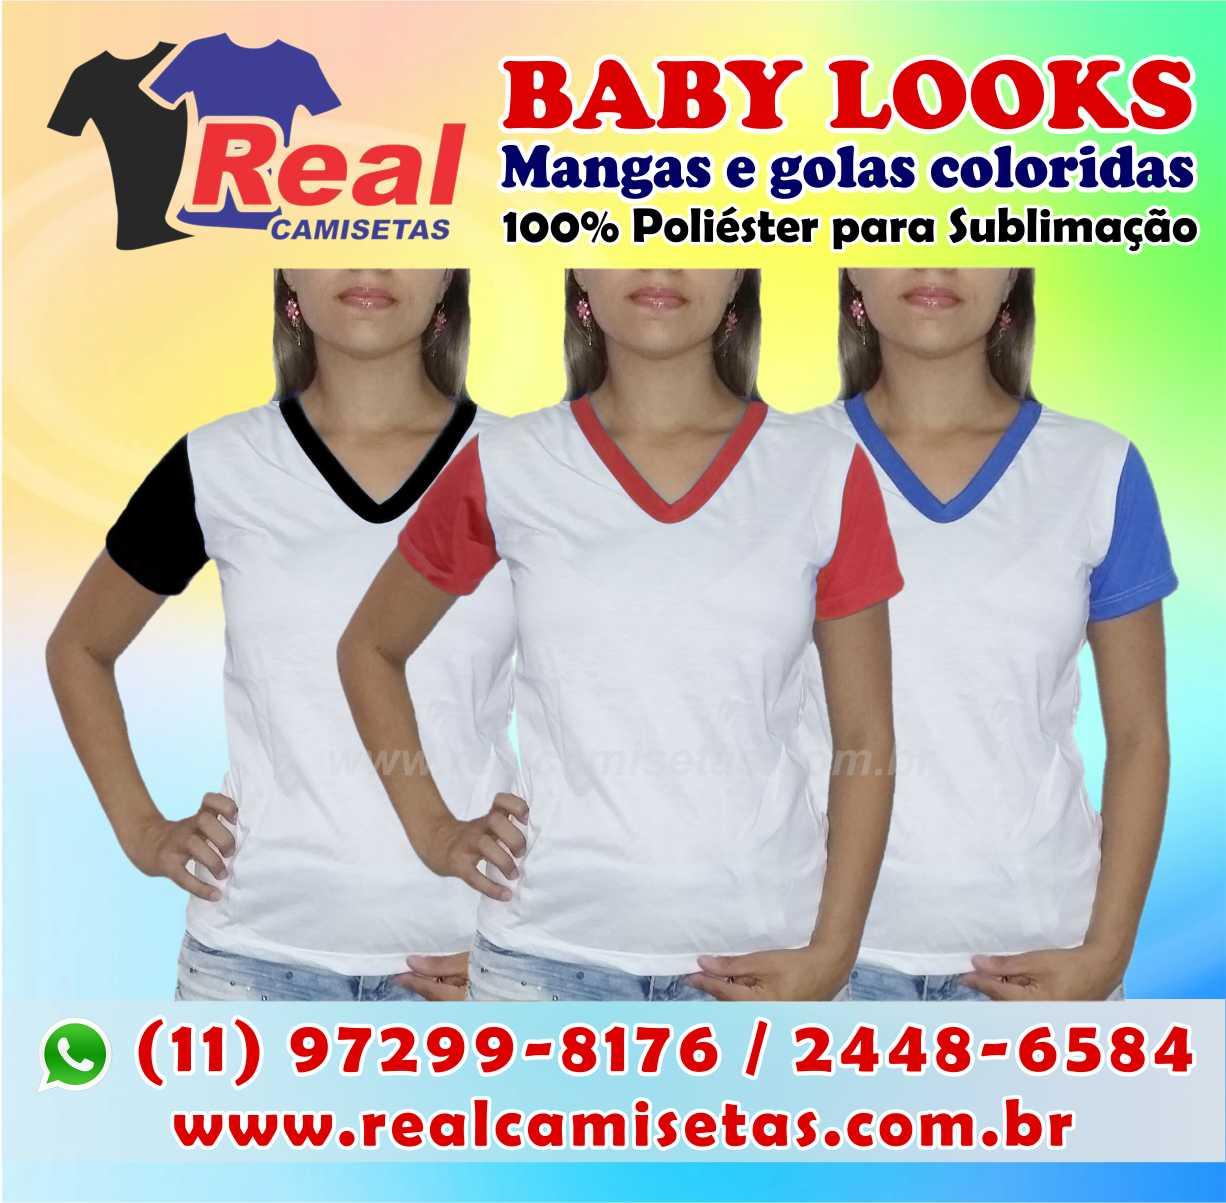 BABY LOOK MANGAS COLORIDAS